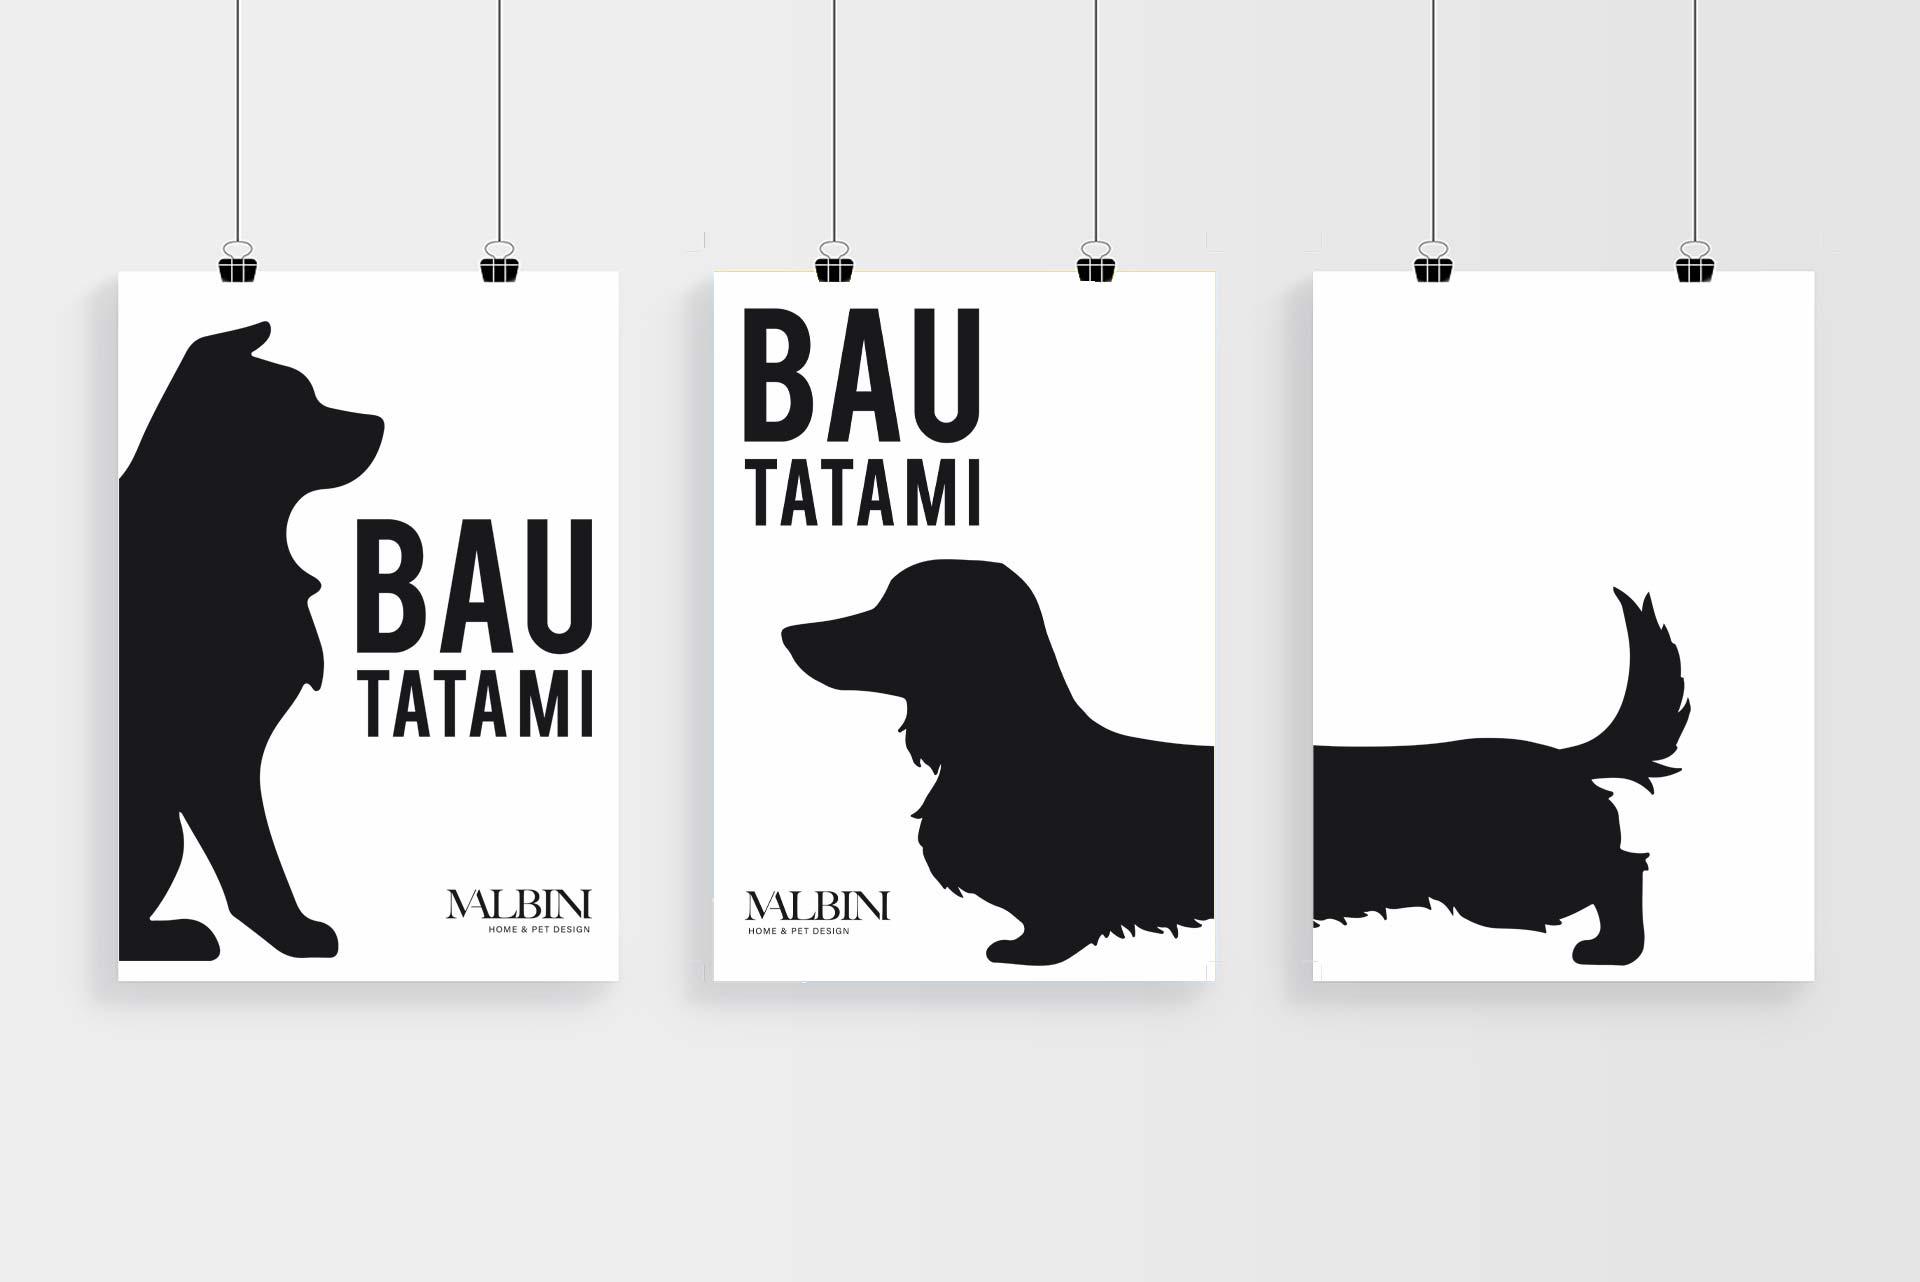 Malbini-poster